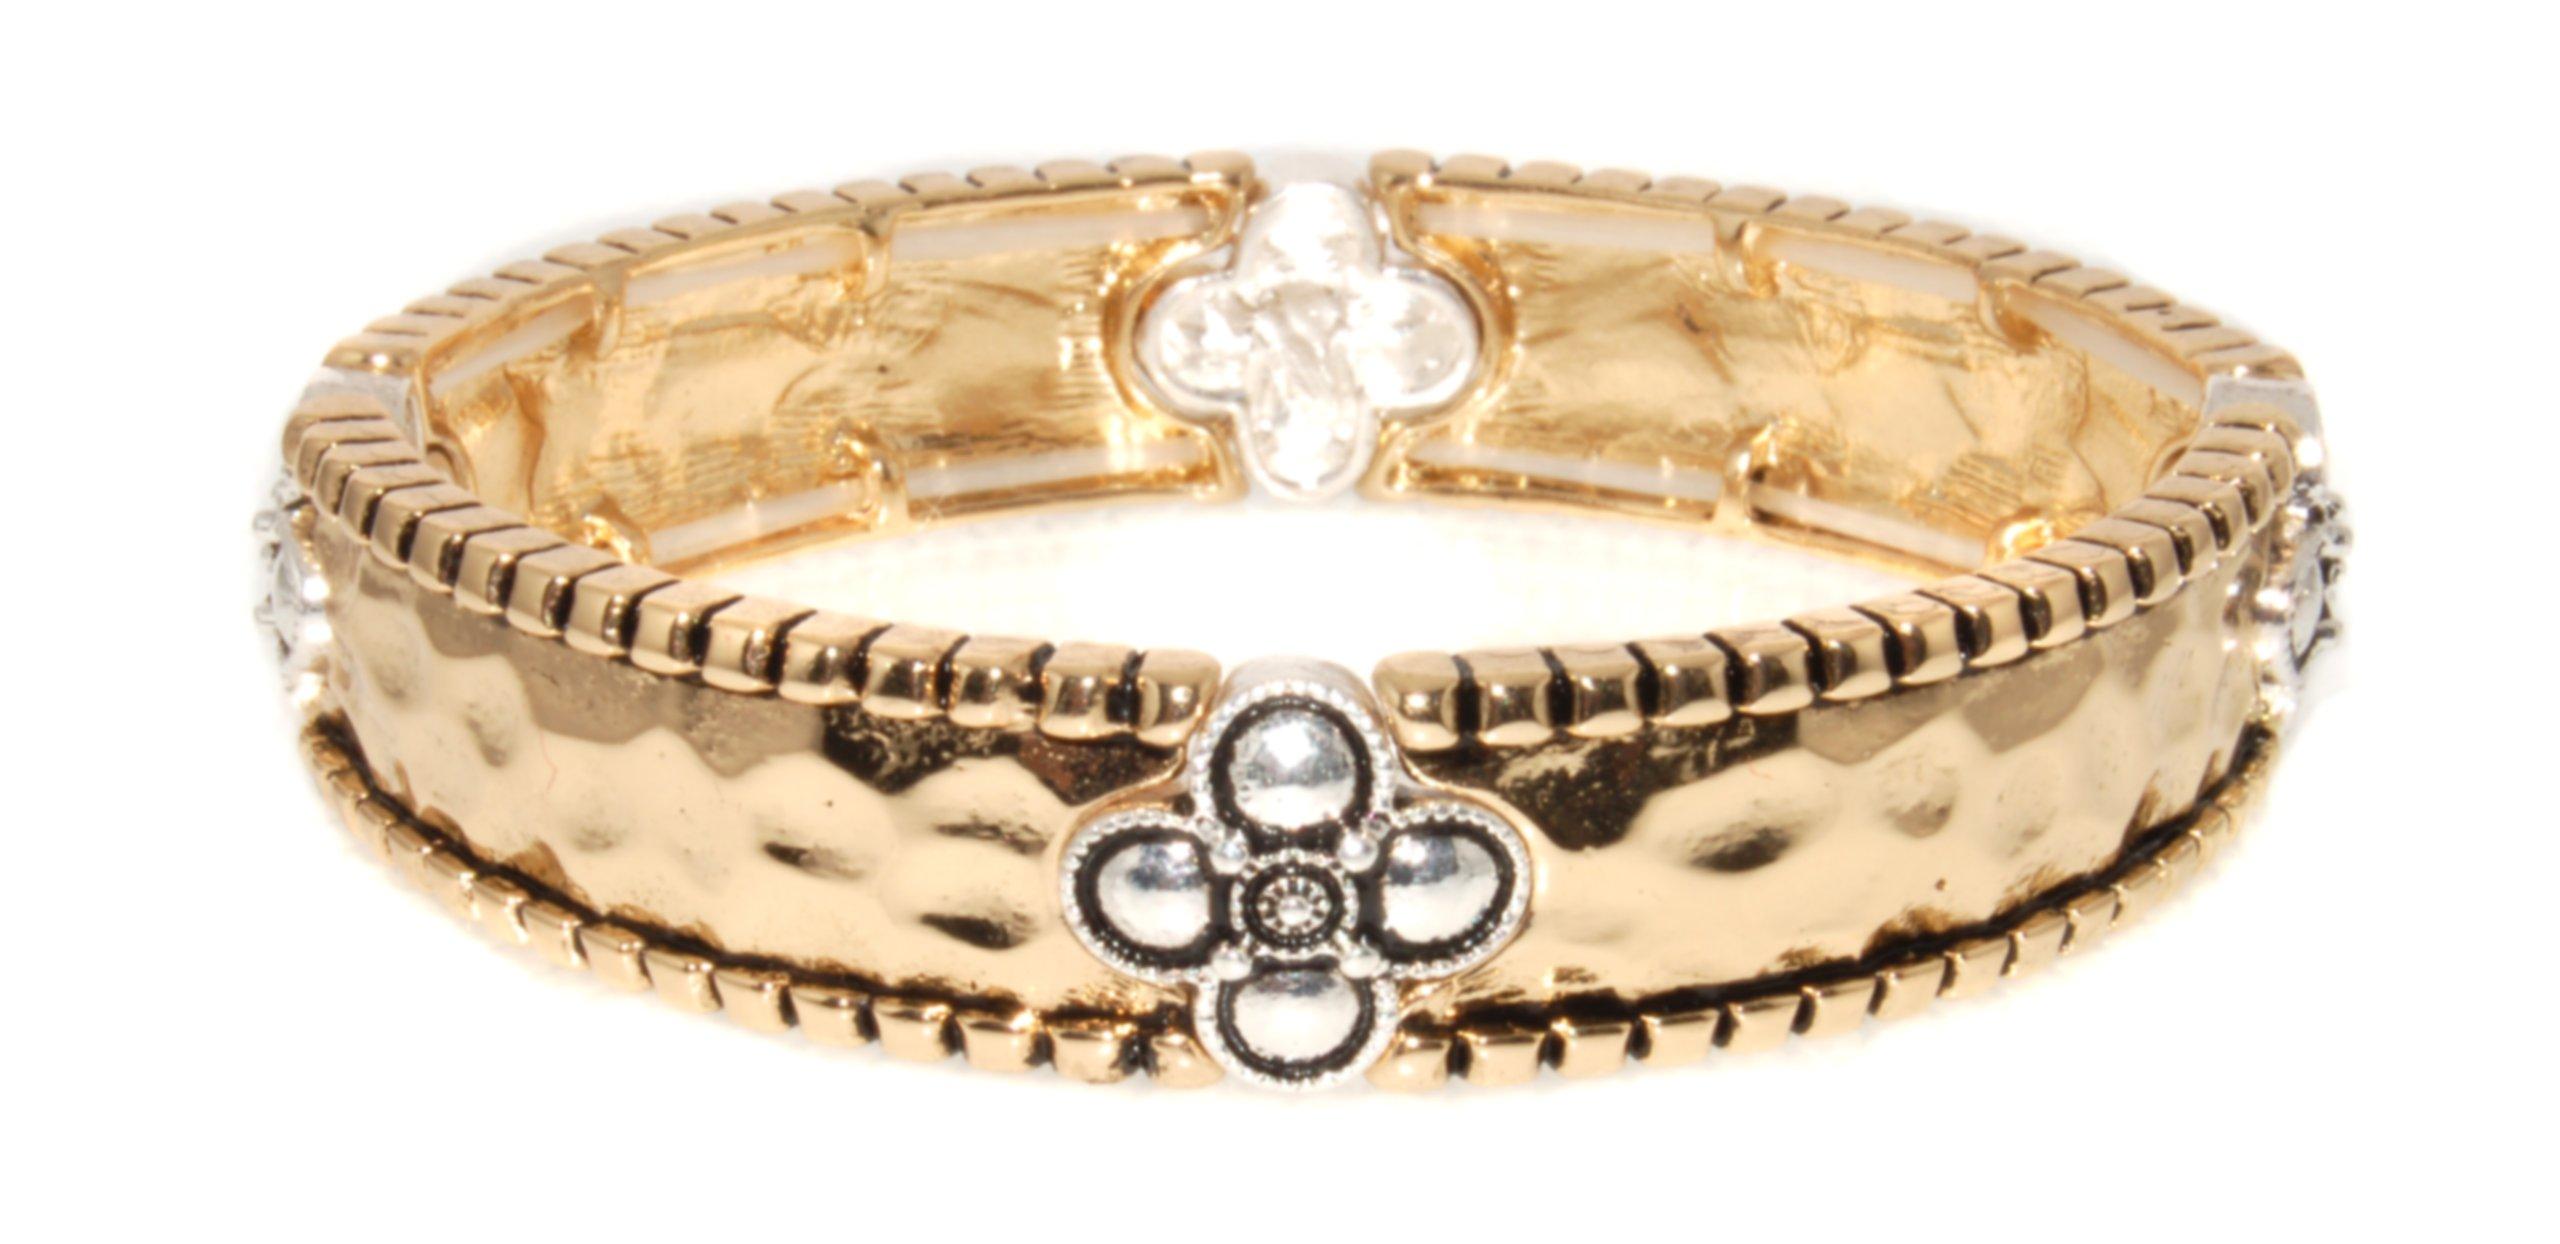 Landau Stretch Bracelet, Goldtone with Silvertone Clover Stations